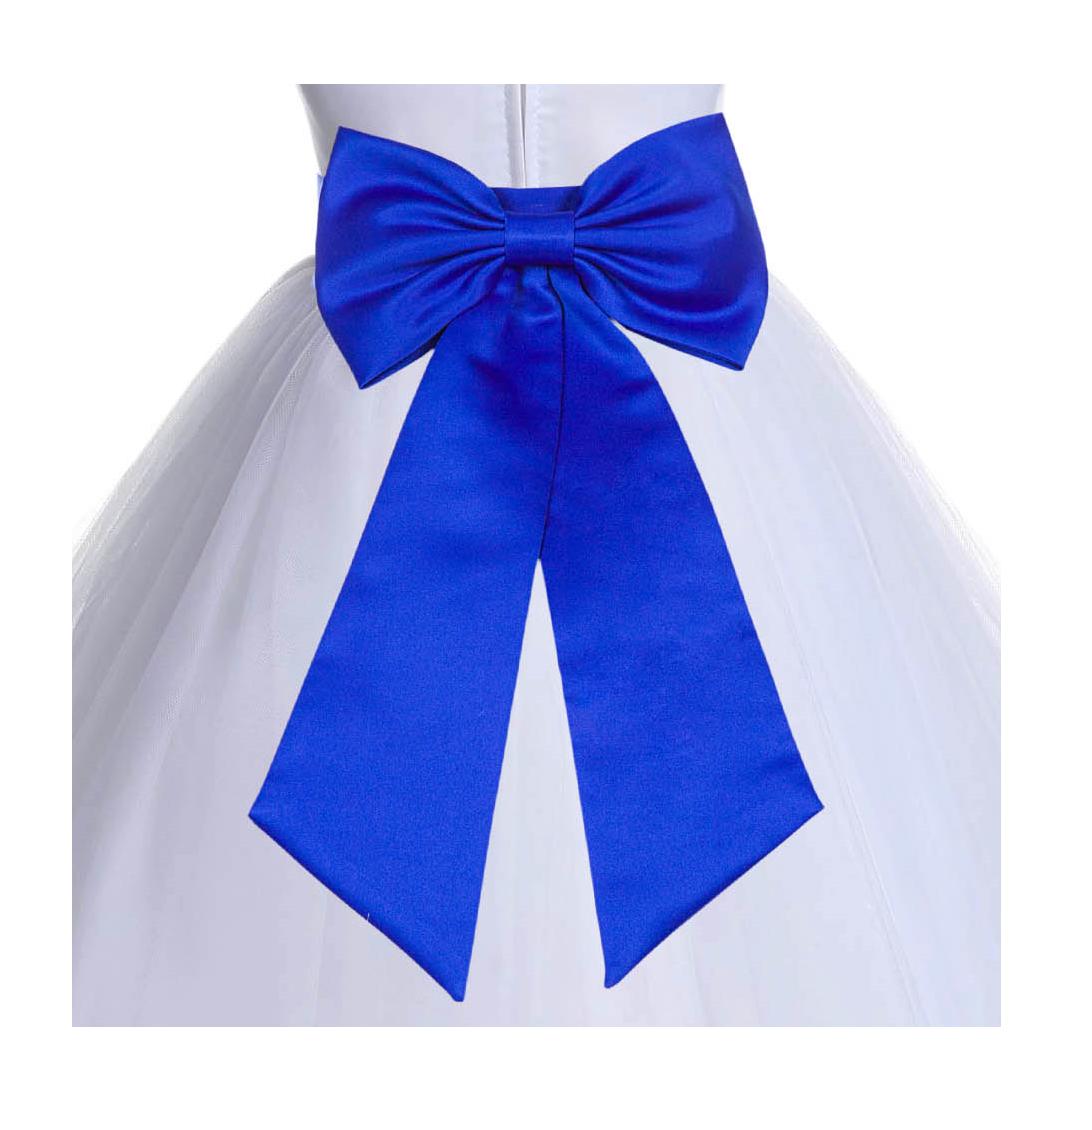 Horizon Blue Tiebow